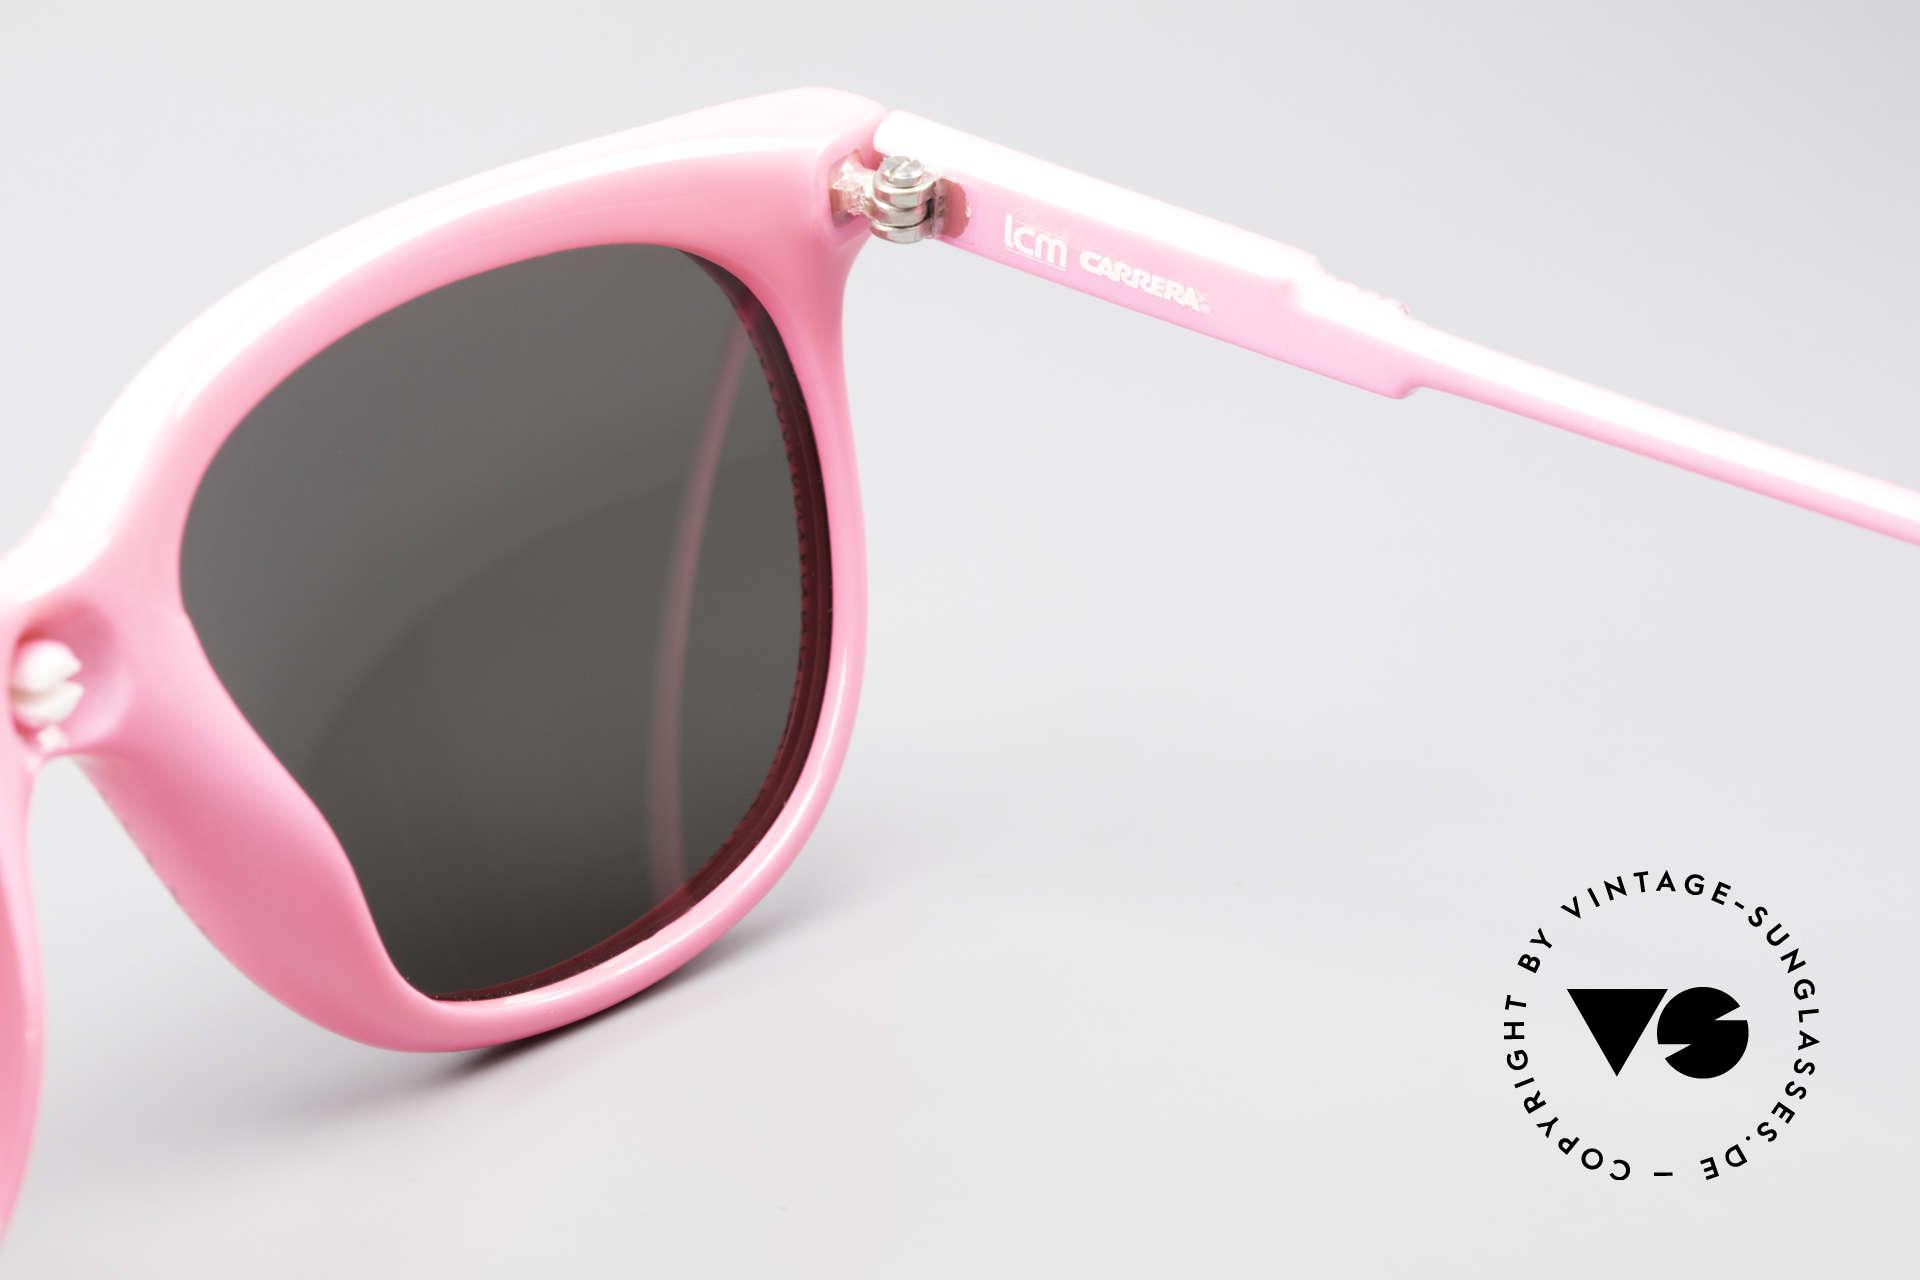 Carrera 5426 Pink Ladies Sports Sunglasses, Size: medium, Made for Women